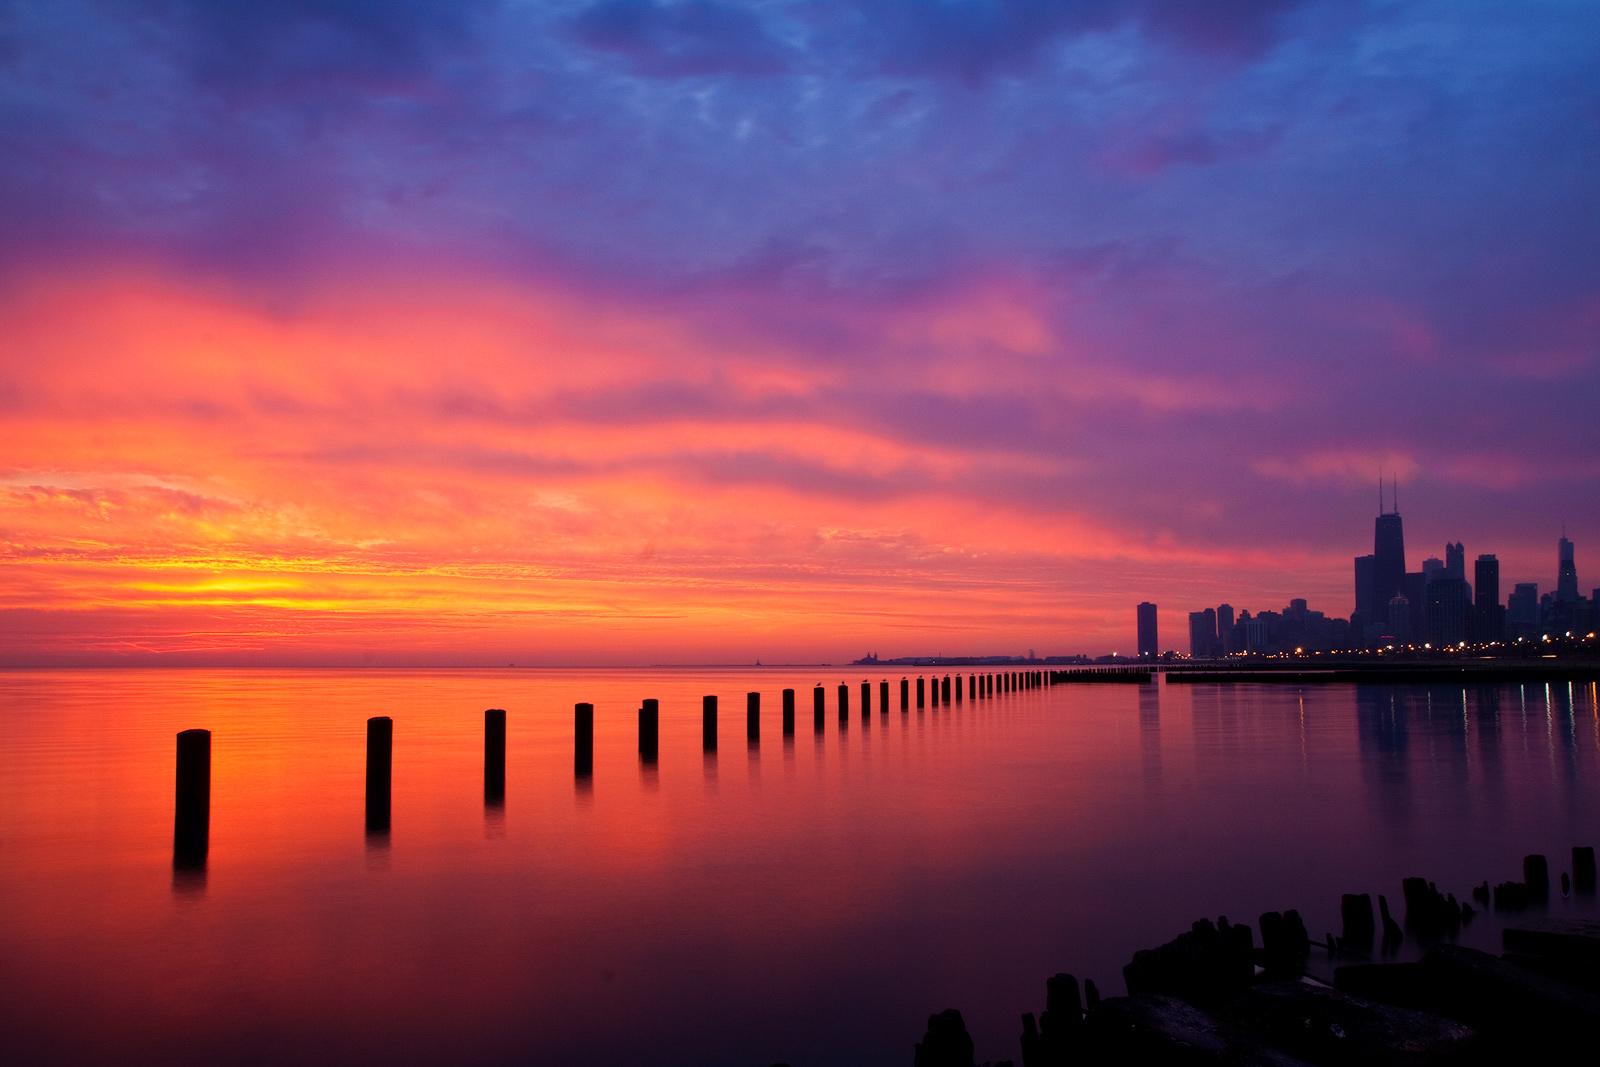 america,beautiful,chicago,city scape,cityscape,horizontal,il,illinois,lake michigan,midwest,north america,red,sunrise,united states,us,usa, photo